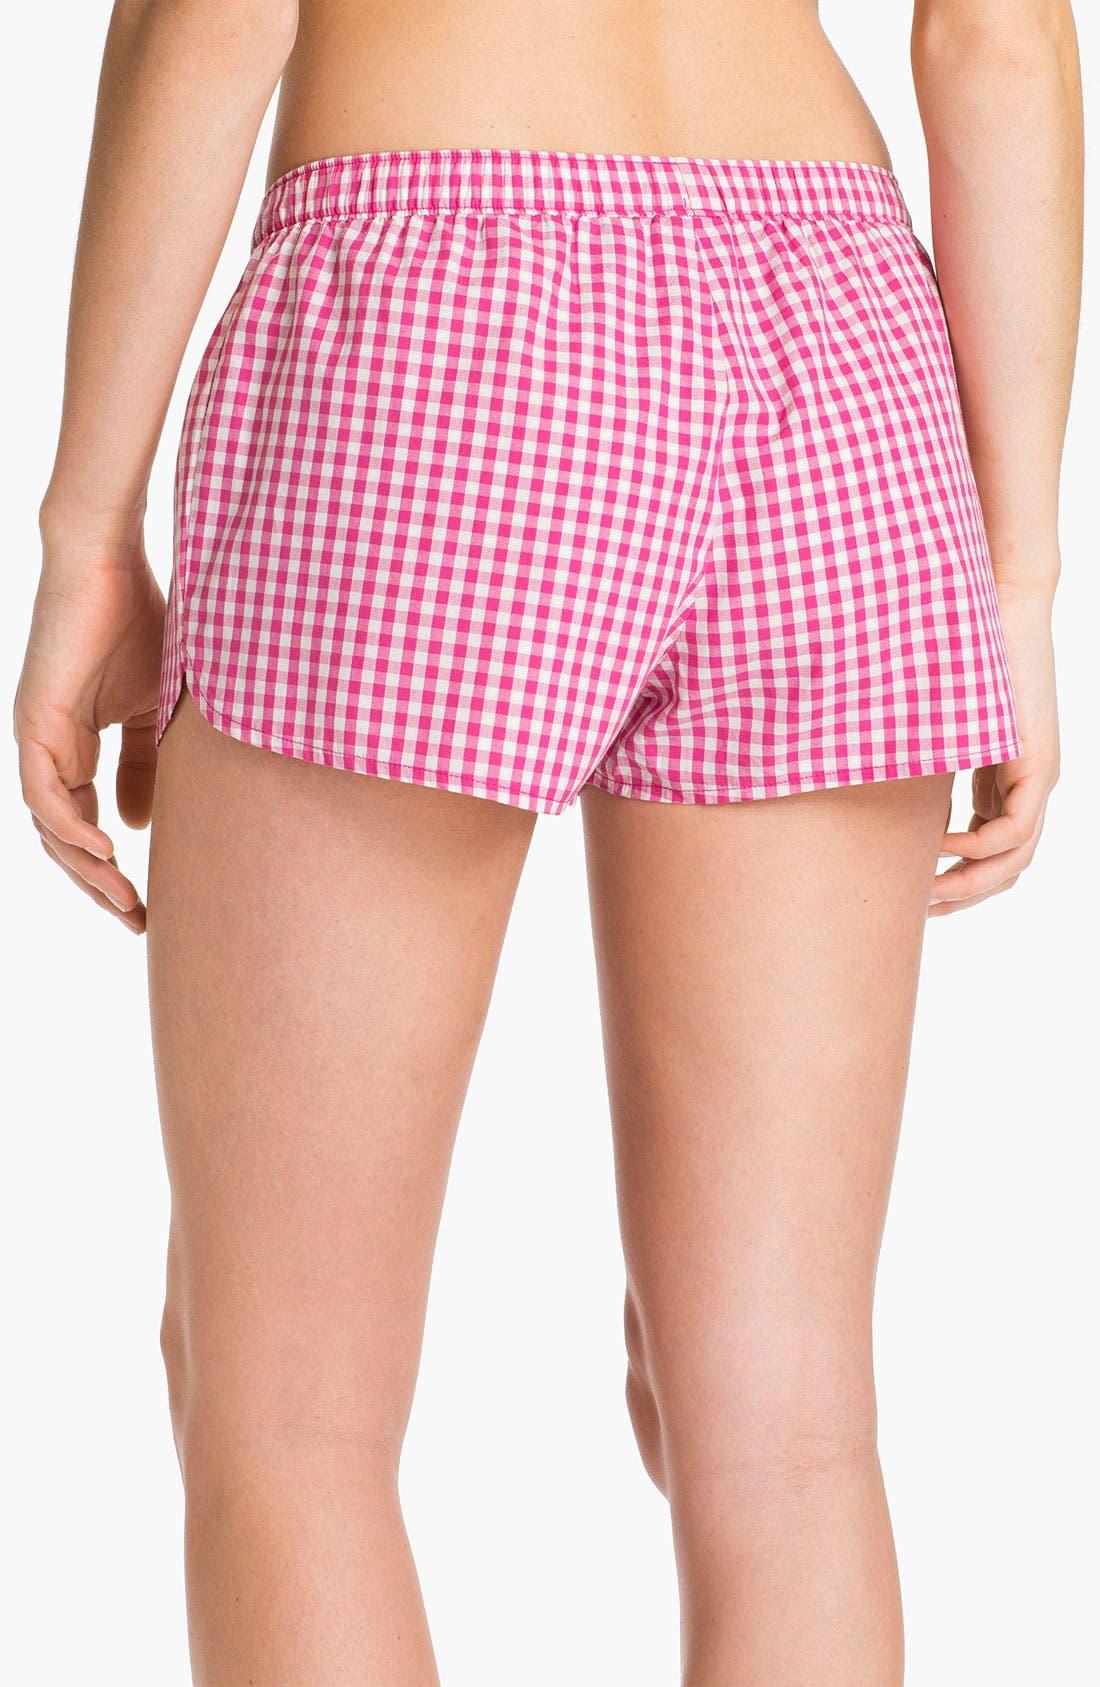 Alternate Image 2  - Make + Model 'Short but Sweet' Lounge Shorts